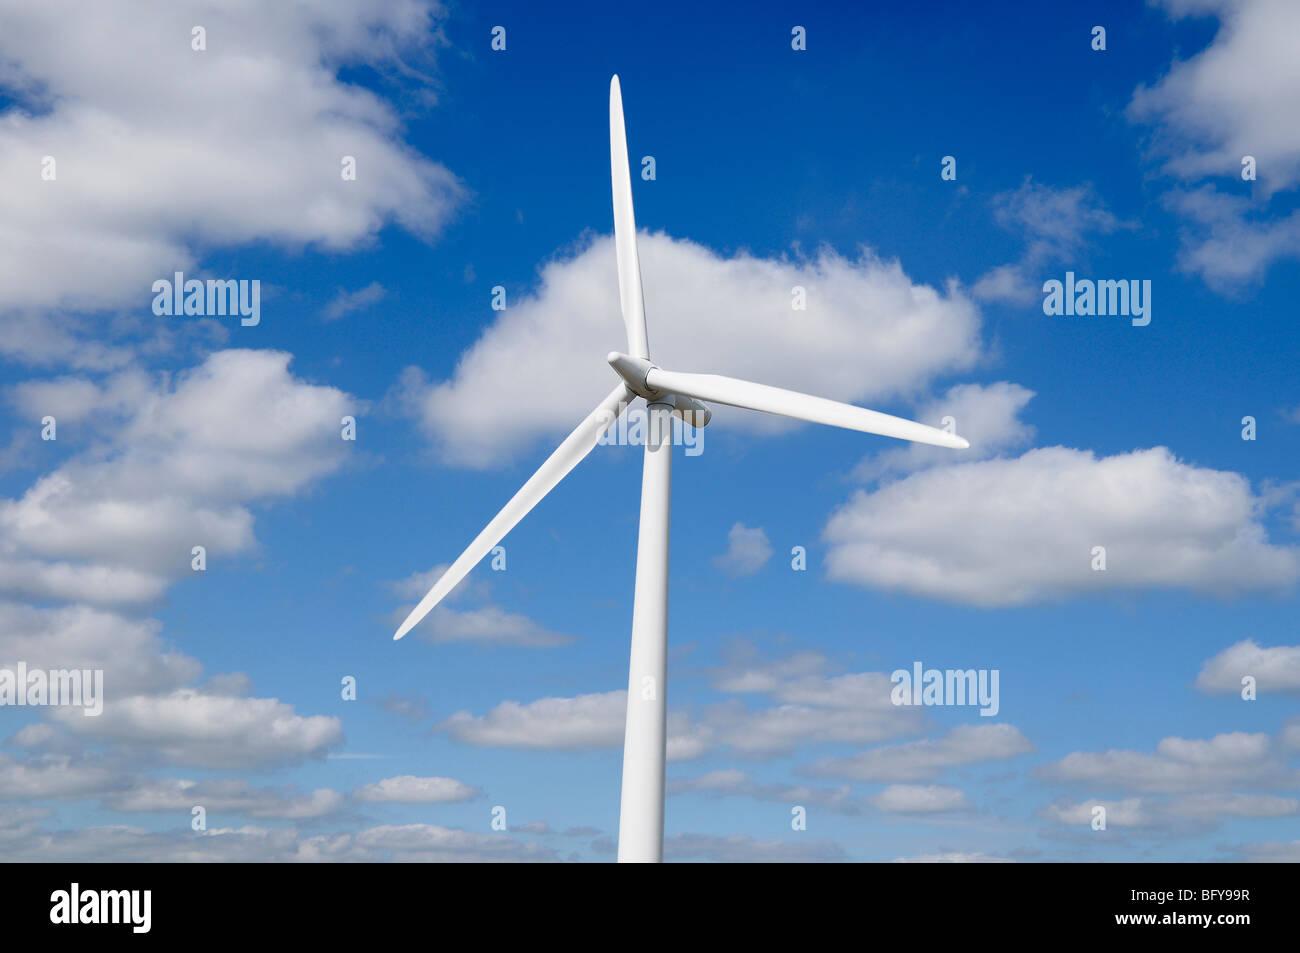 Aerogenerador contra una nube llenó el cielo azul Imagen De Stock